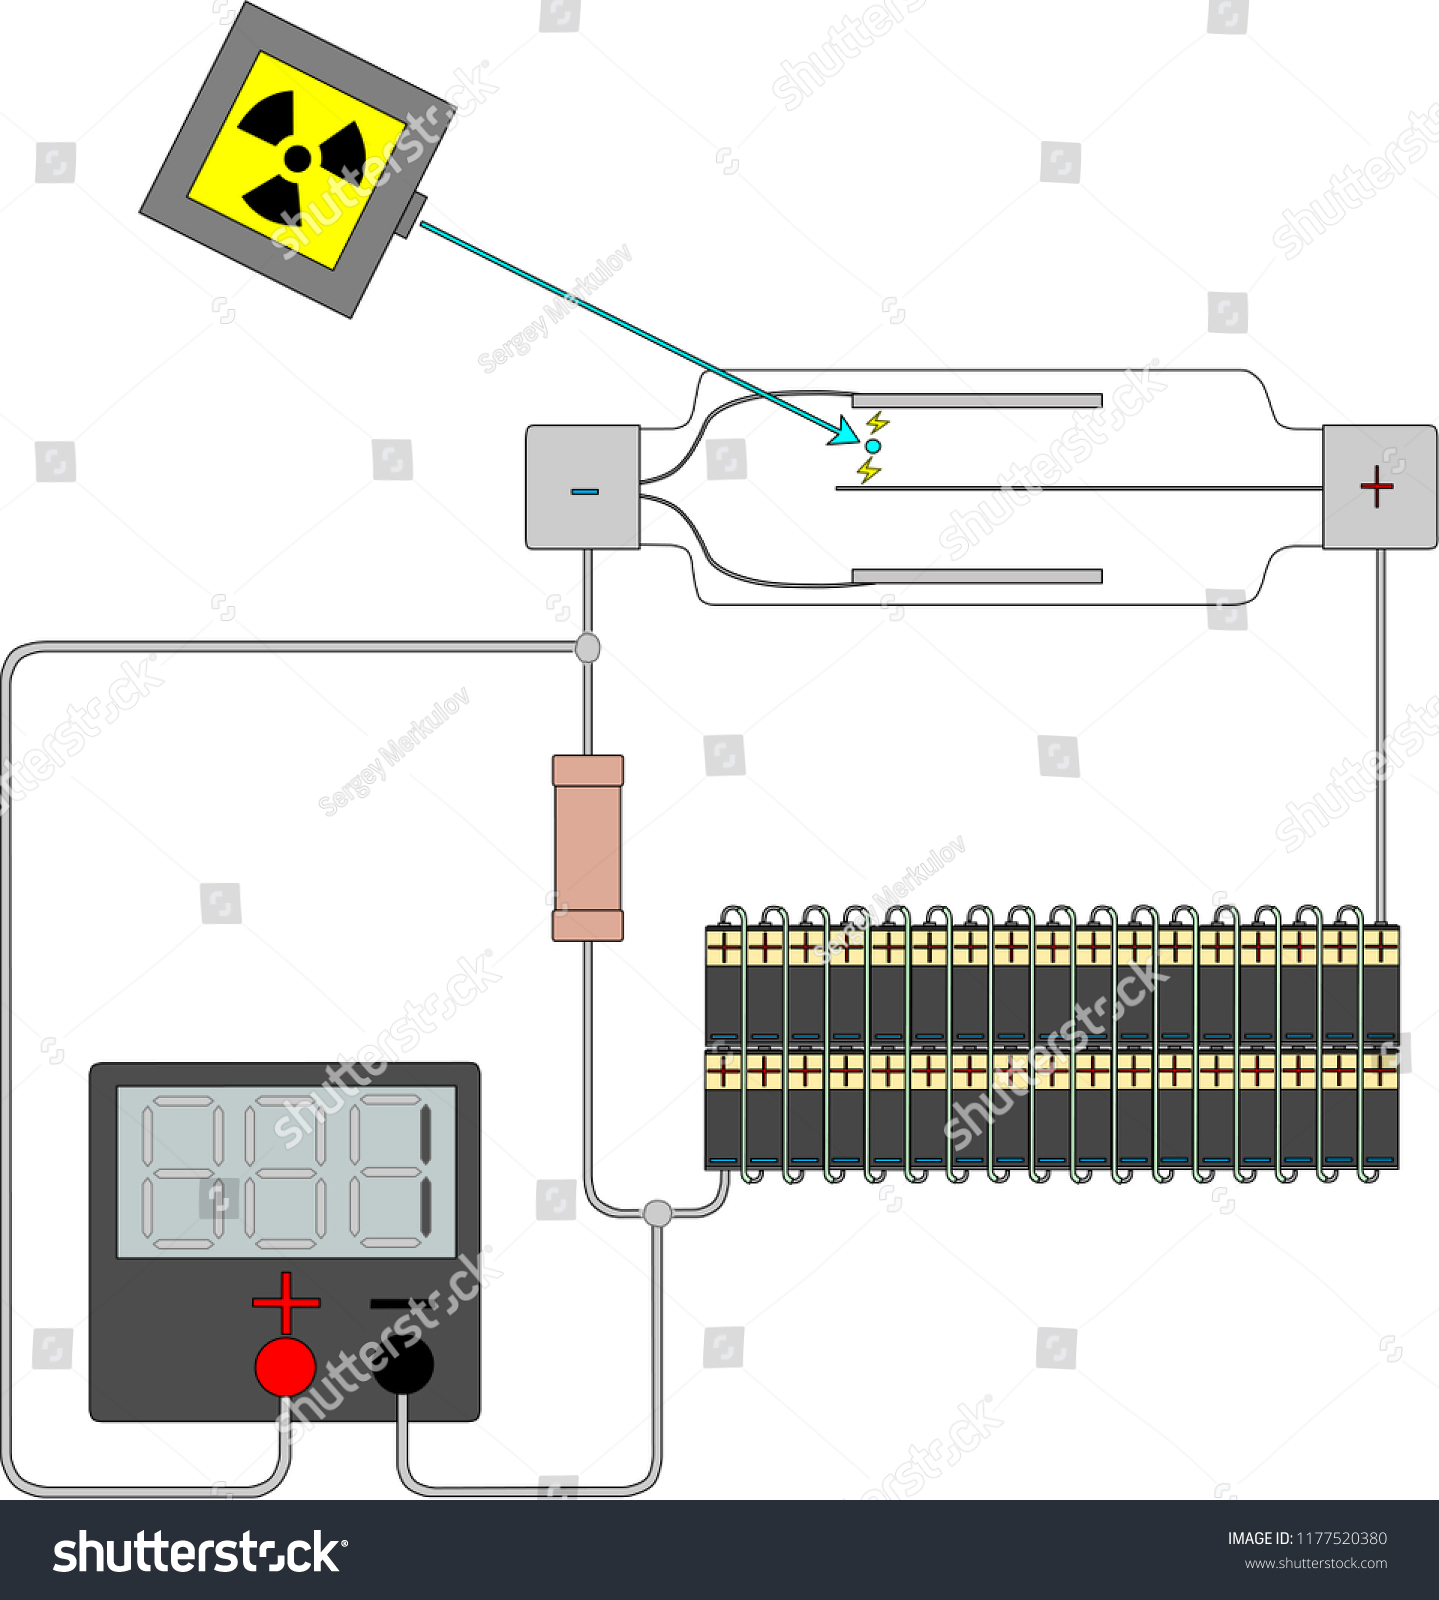 Geiger Counter Tube Stock Vector Royalty Free 1177520380 Diagram